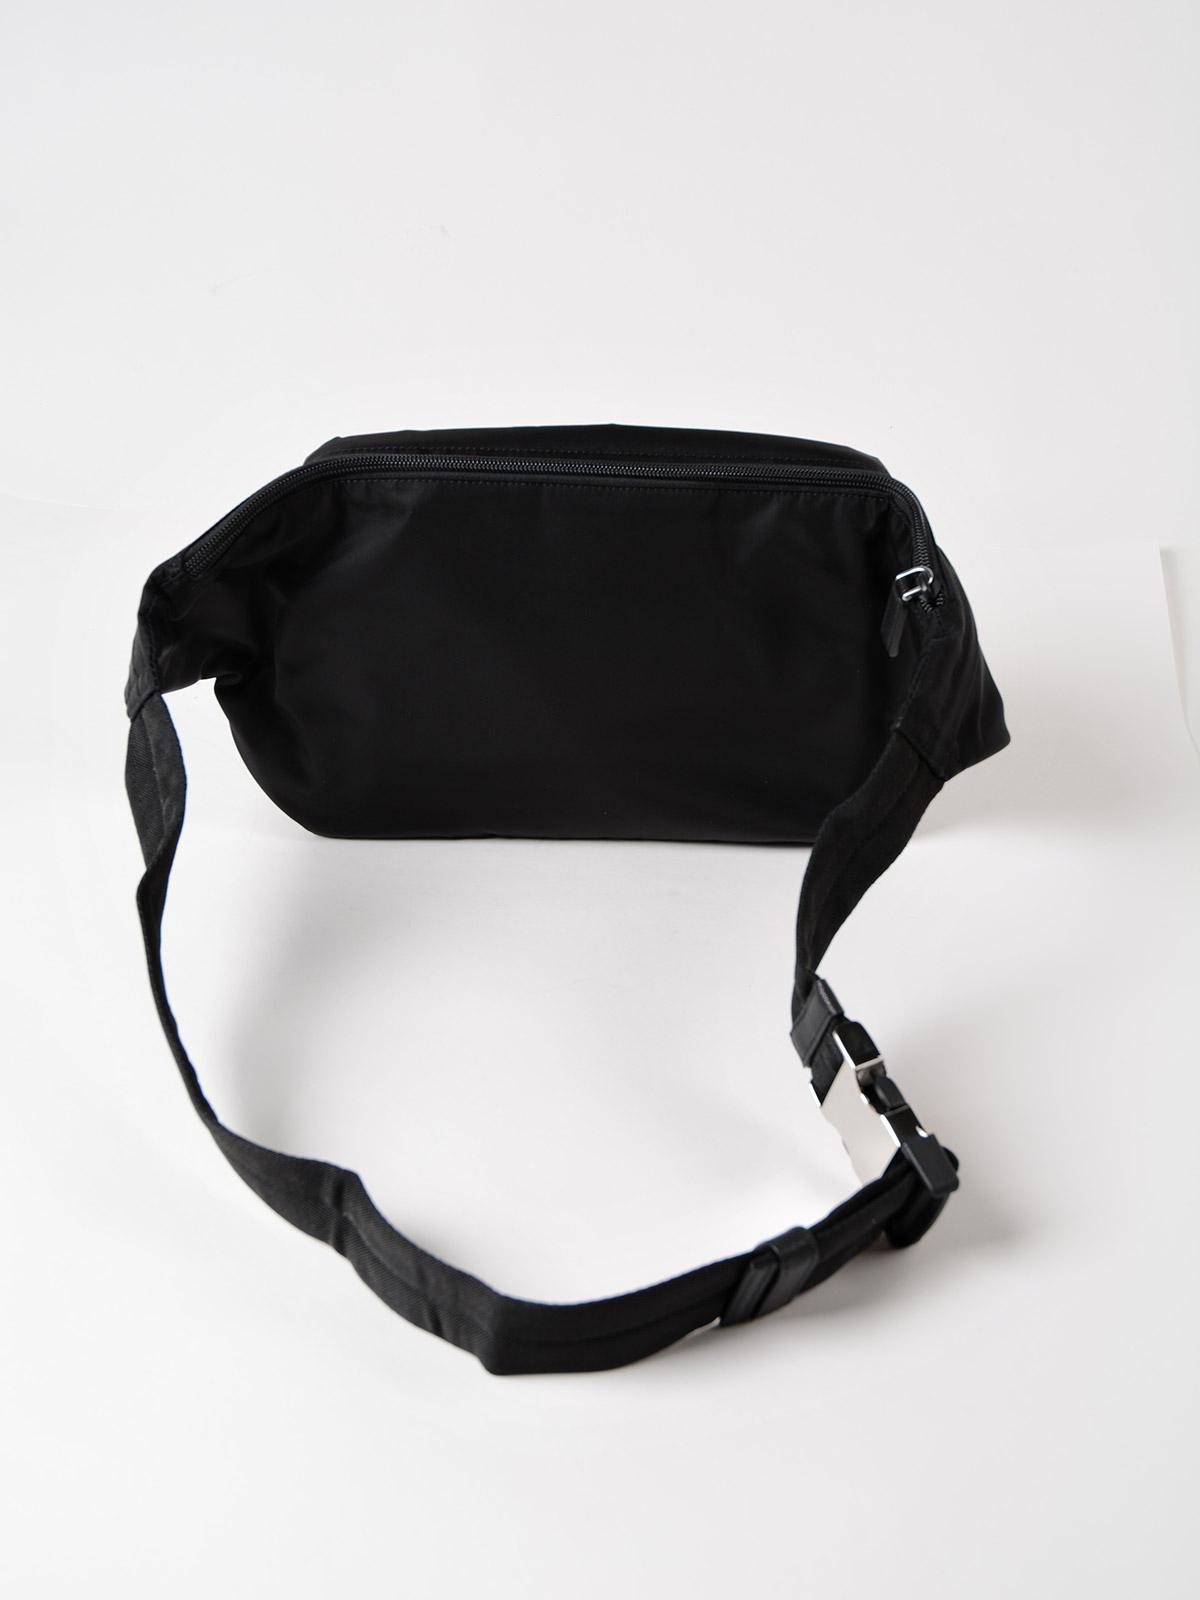 181c745daca8 Prada Tessuto Montagna Belt Bag in Black for Men - Lyst